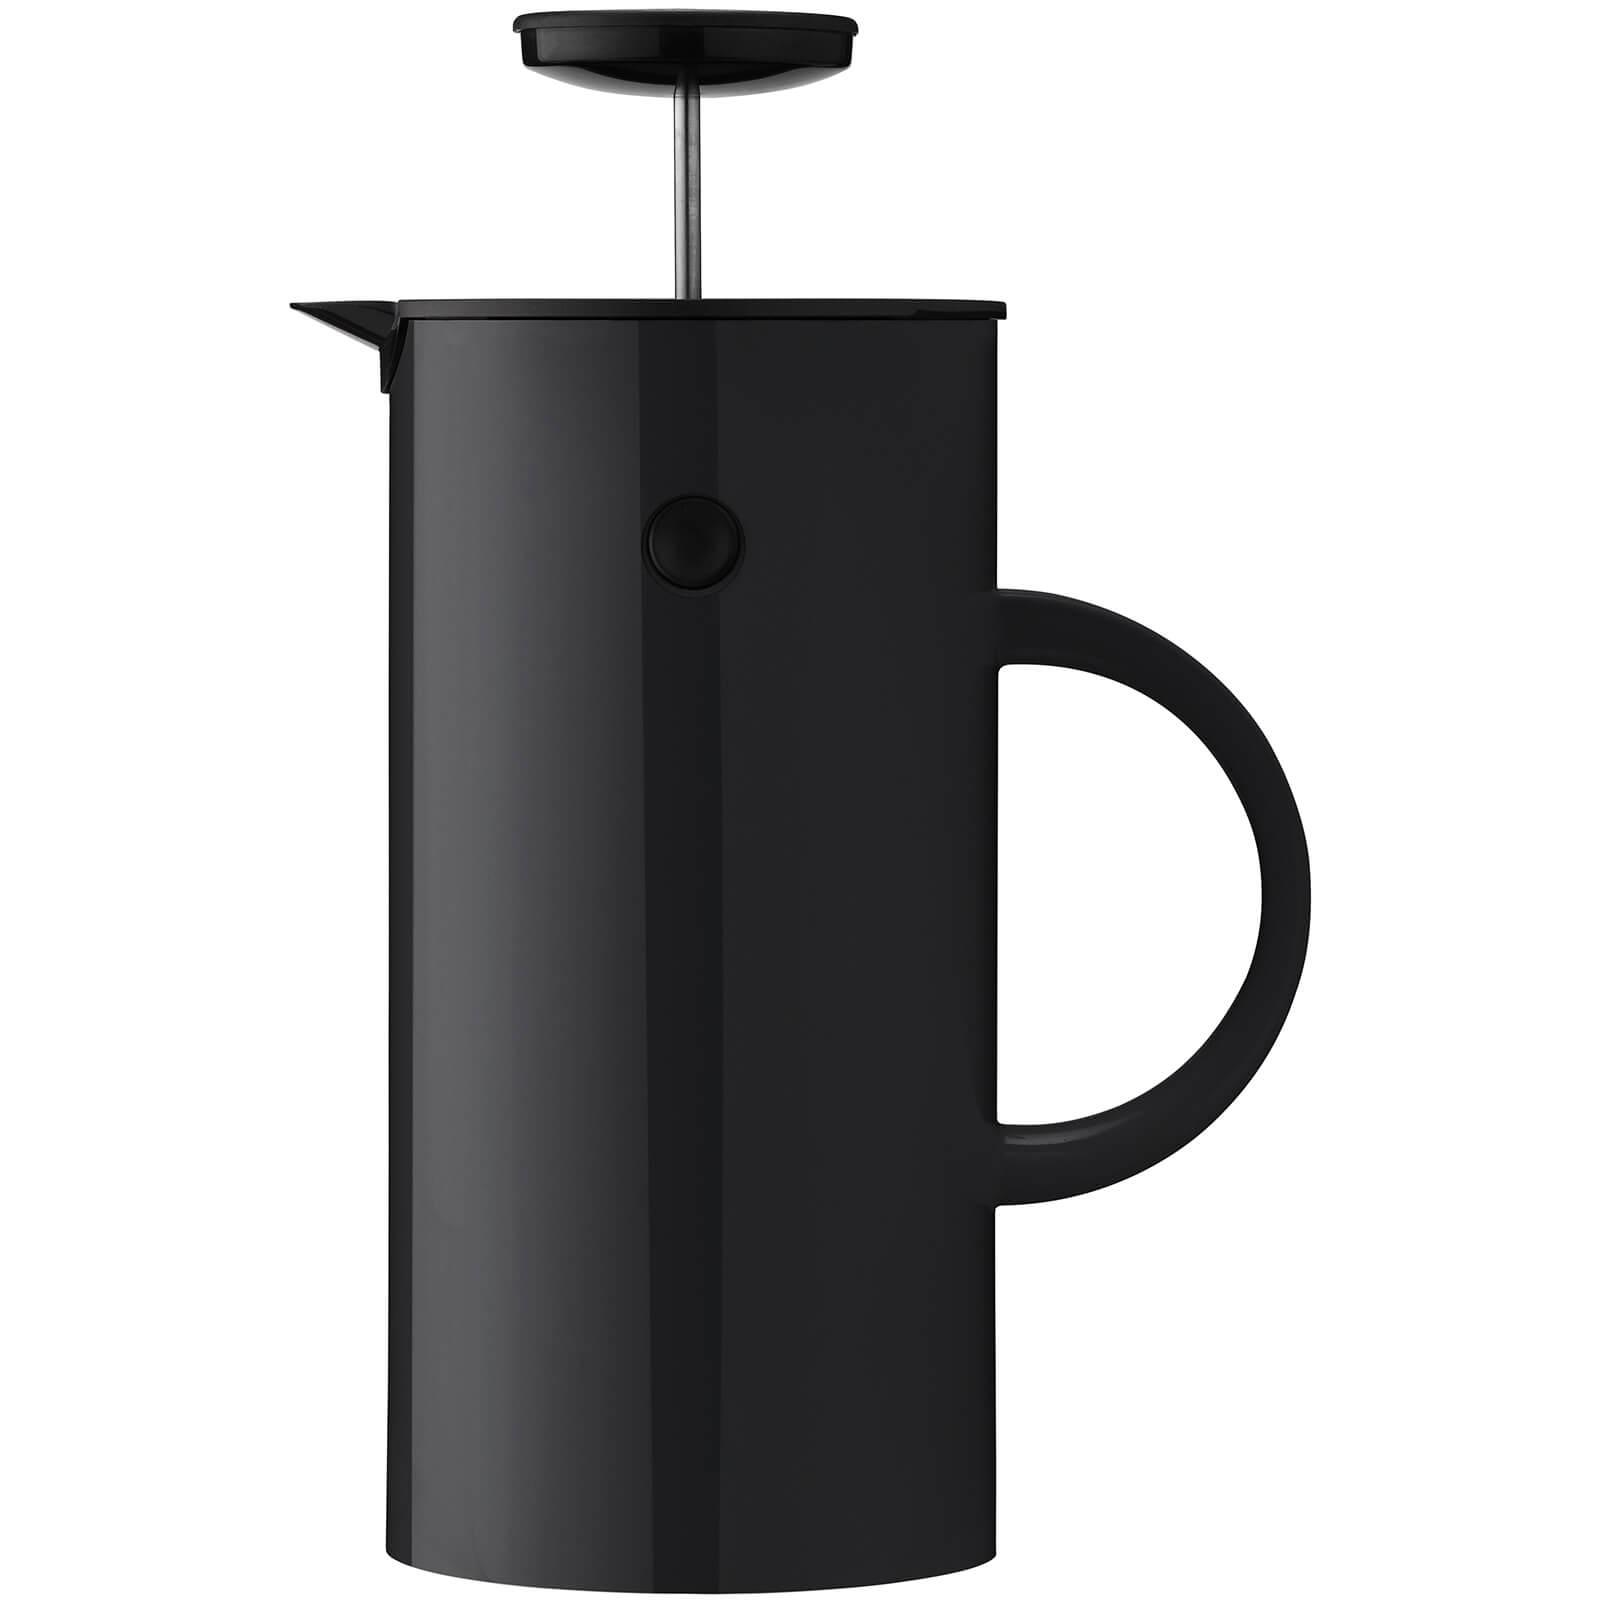 Stelton EM Press Tea Maker - 1L - Black